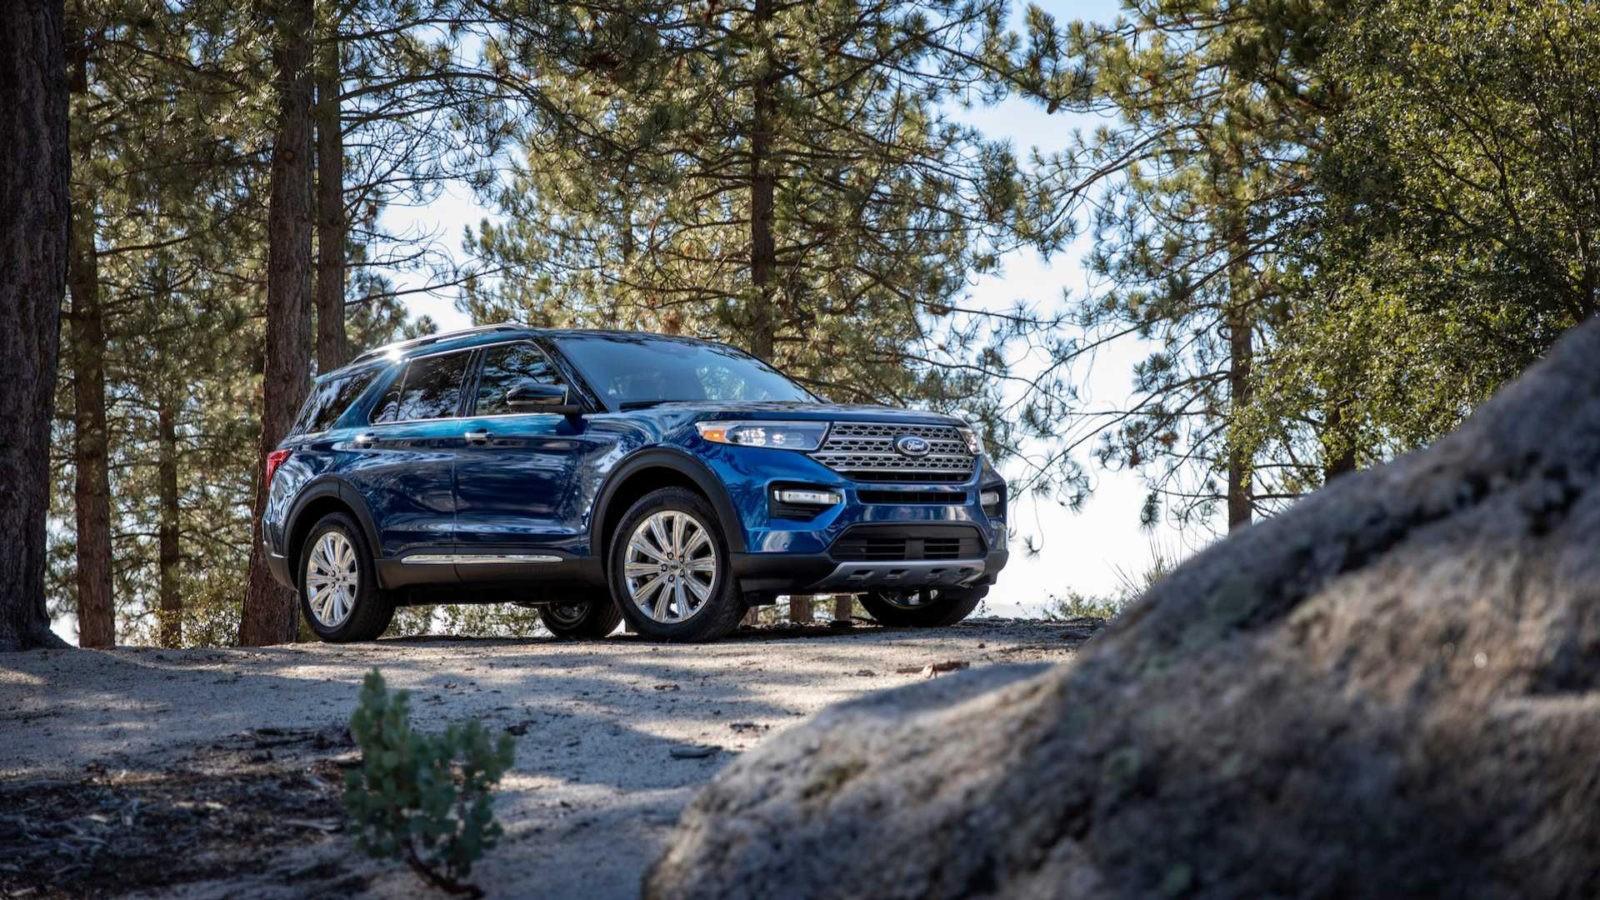 Novyj Ford Explorer 2020 jekster'er, vneshnij vid,obzor,tehnicheskie harakteristiki, foto